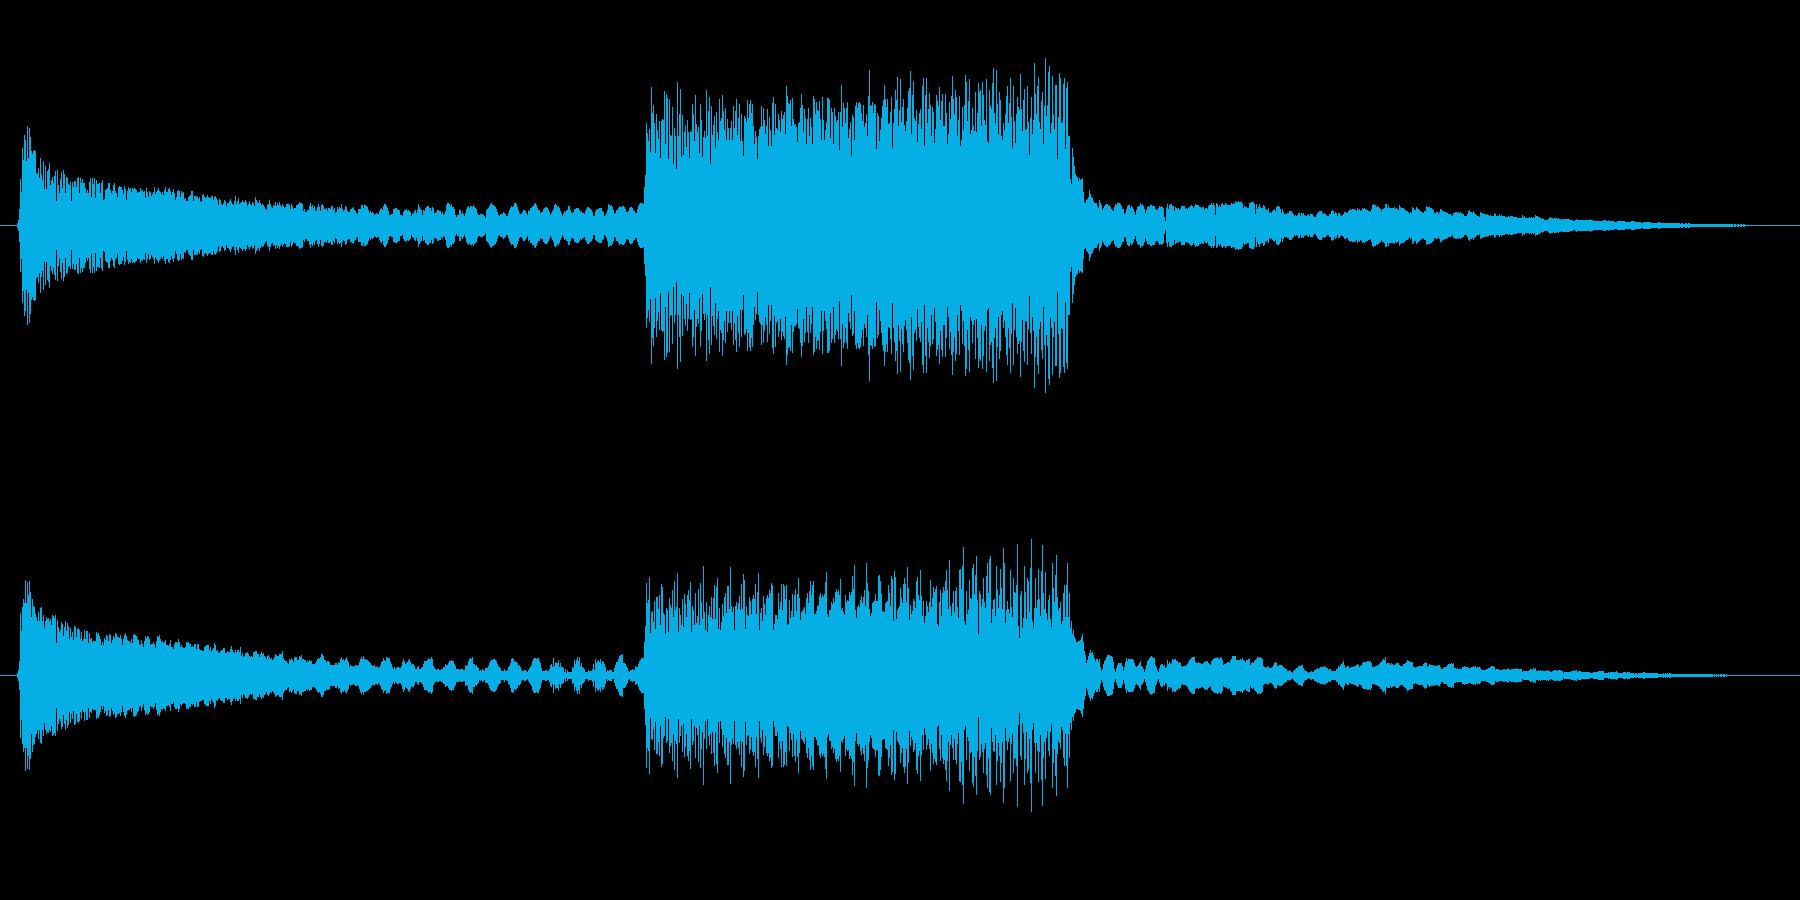 FI デバイス ライズフォール03の再生済みの波形